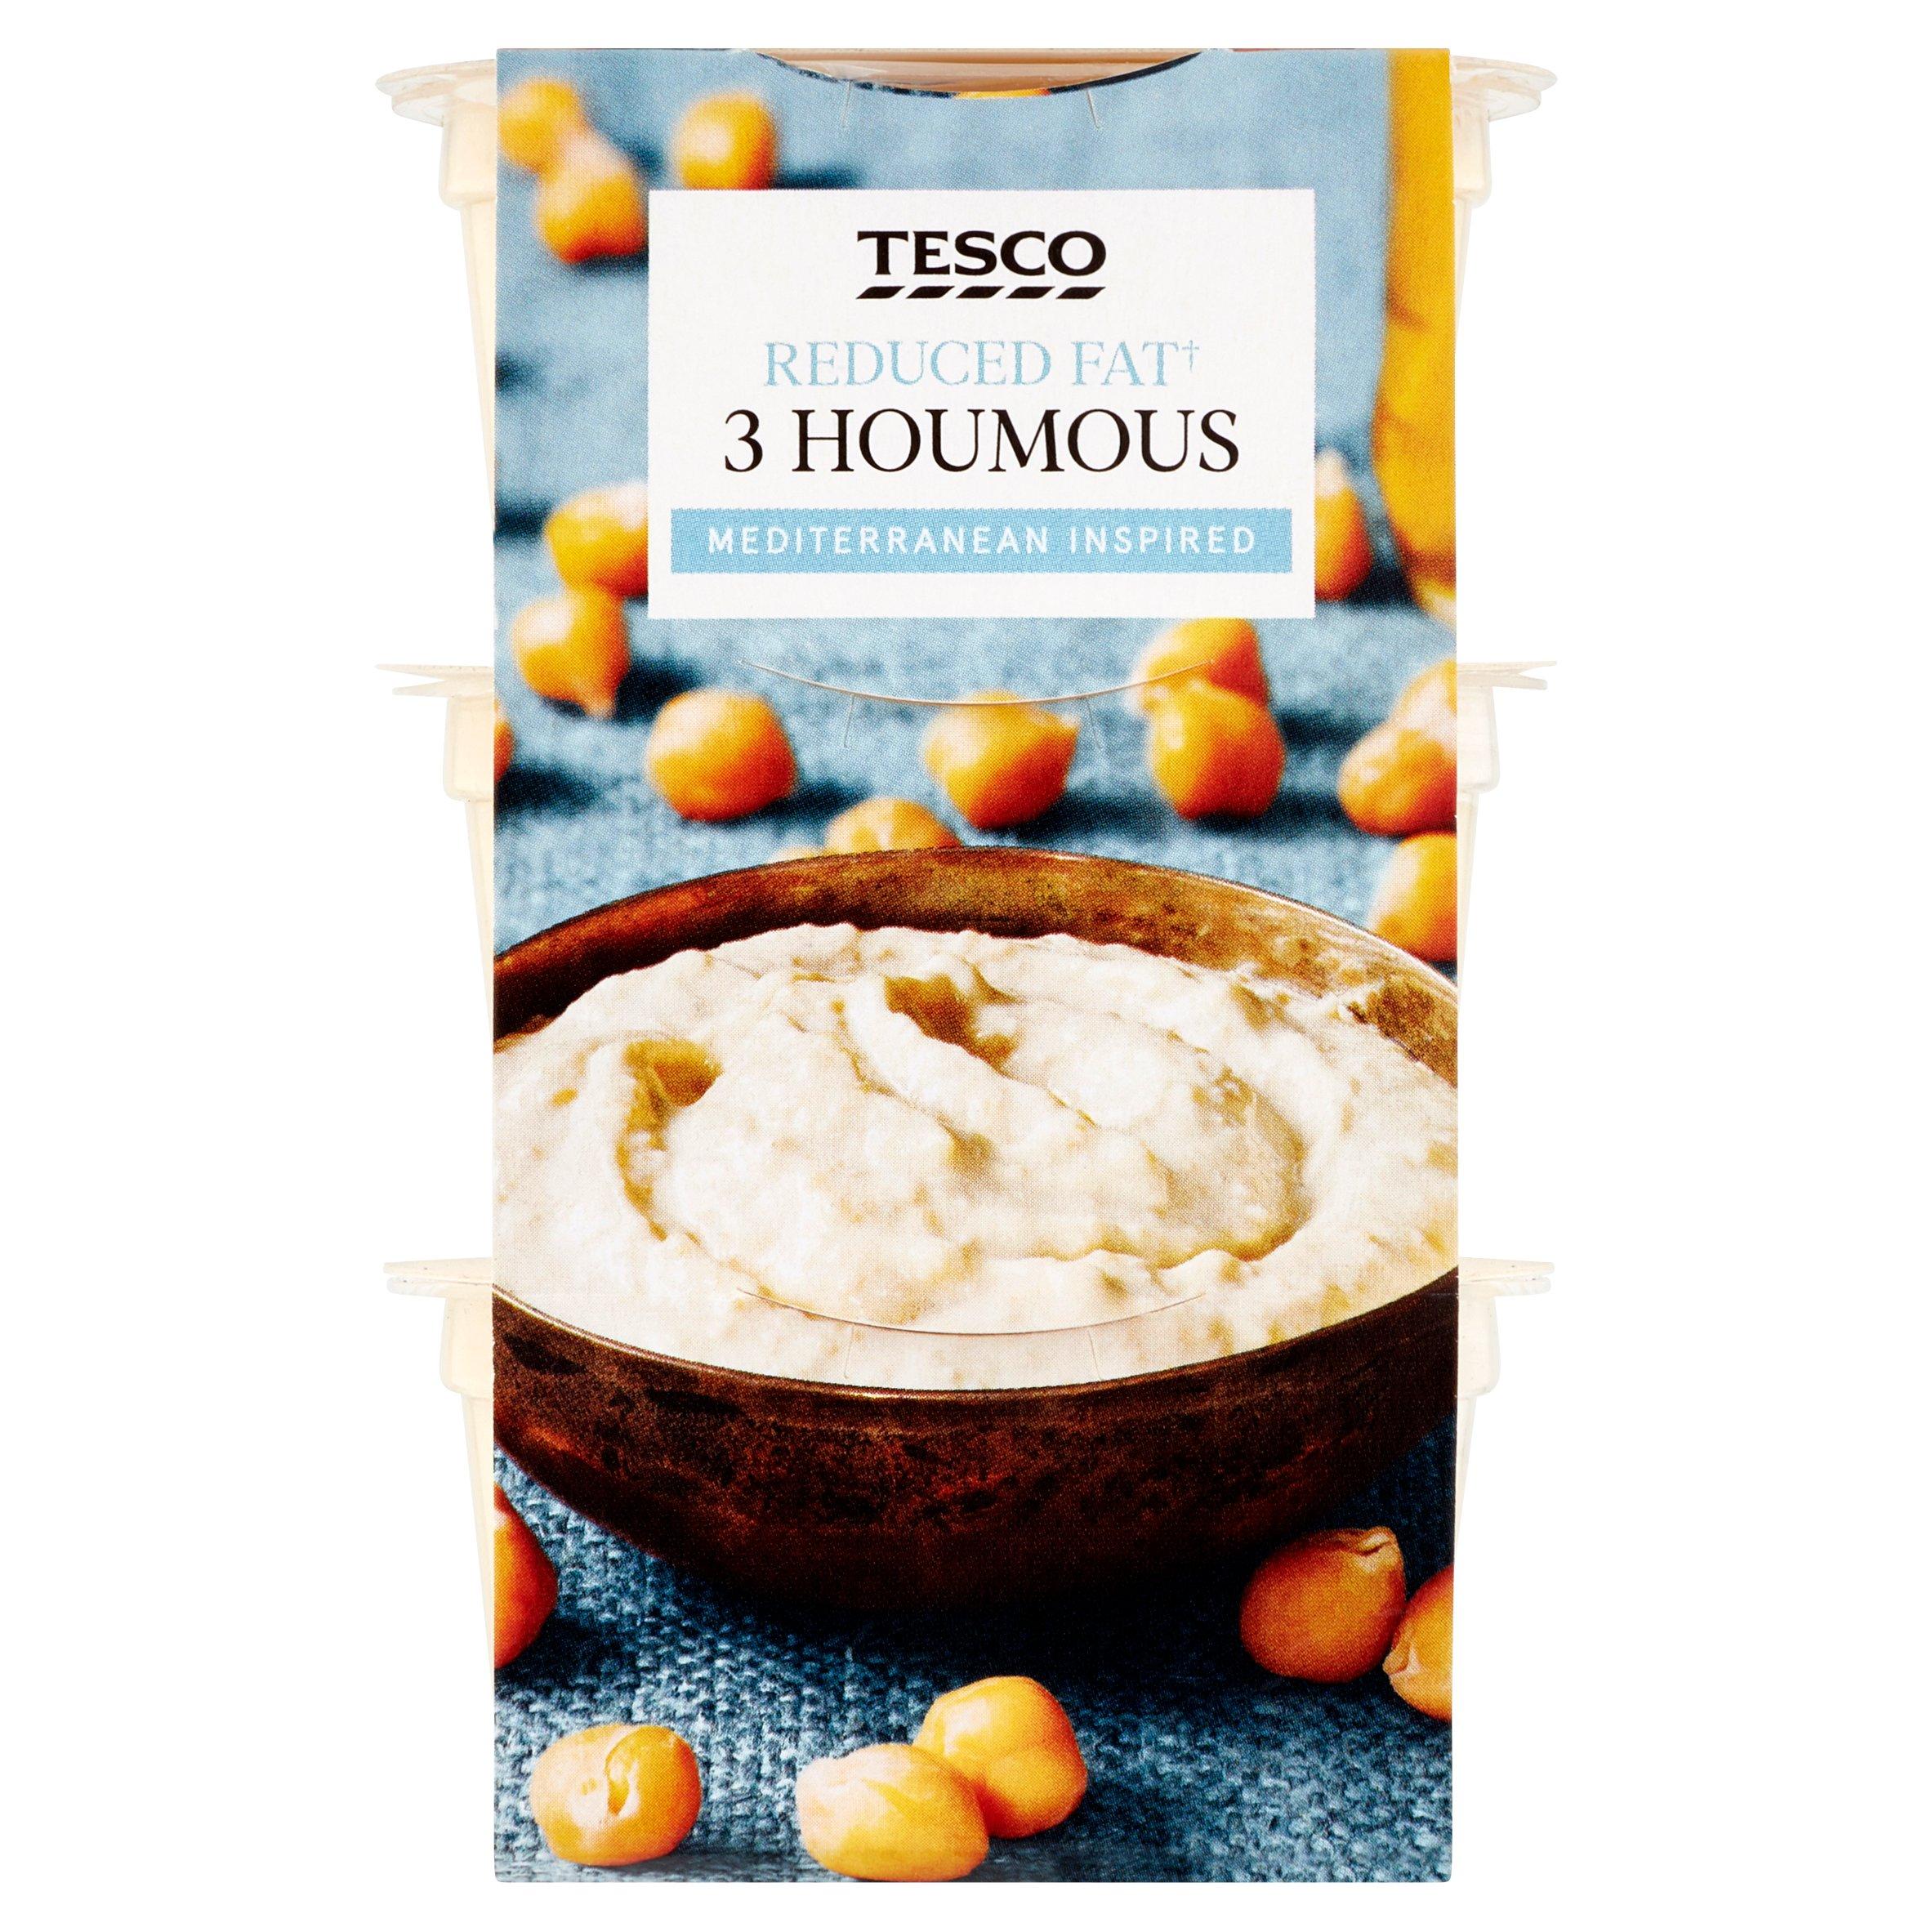 Tesco Reduced Fat Houmous Stacker 210G